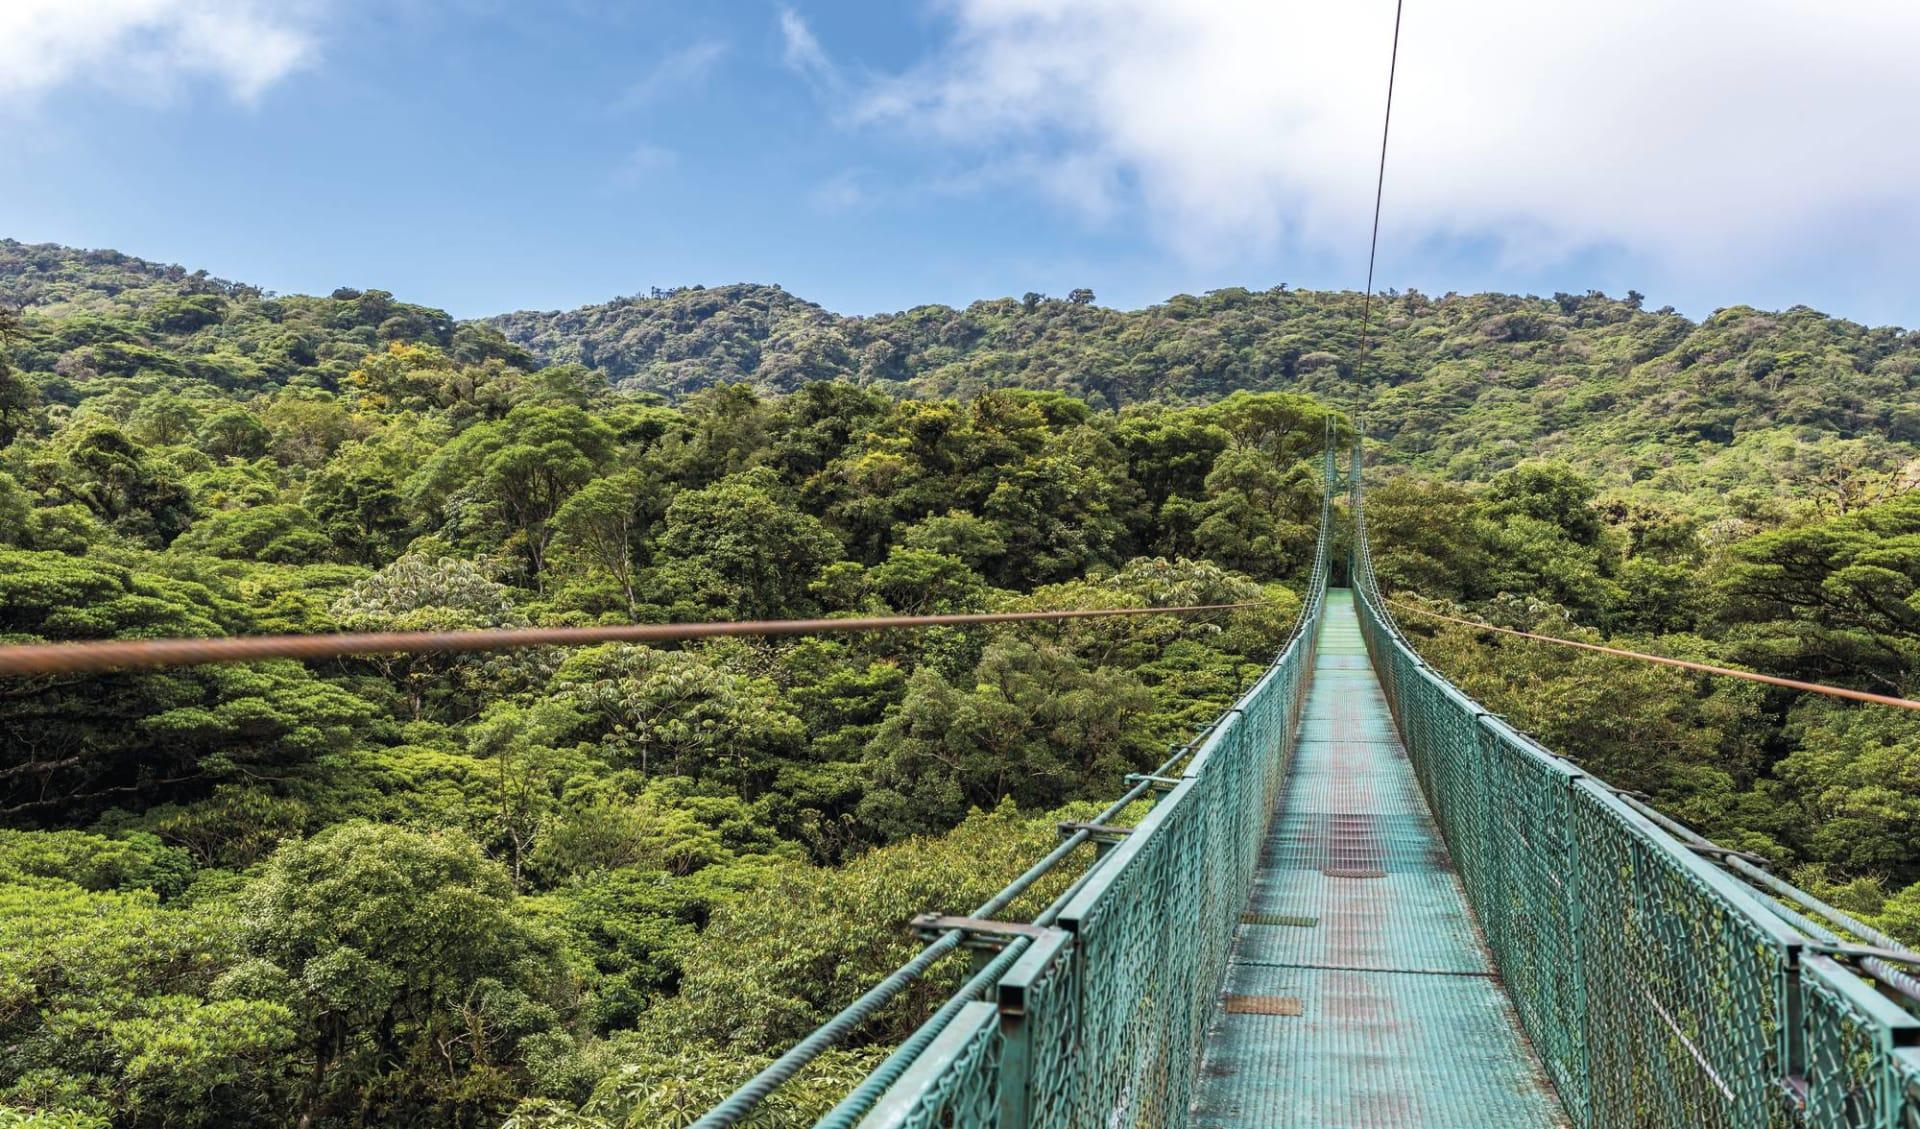 Mietwagenreise Costa Rica Total ab San José City: Costa Rica - Monteverde - Hängebrücke